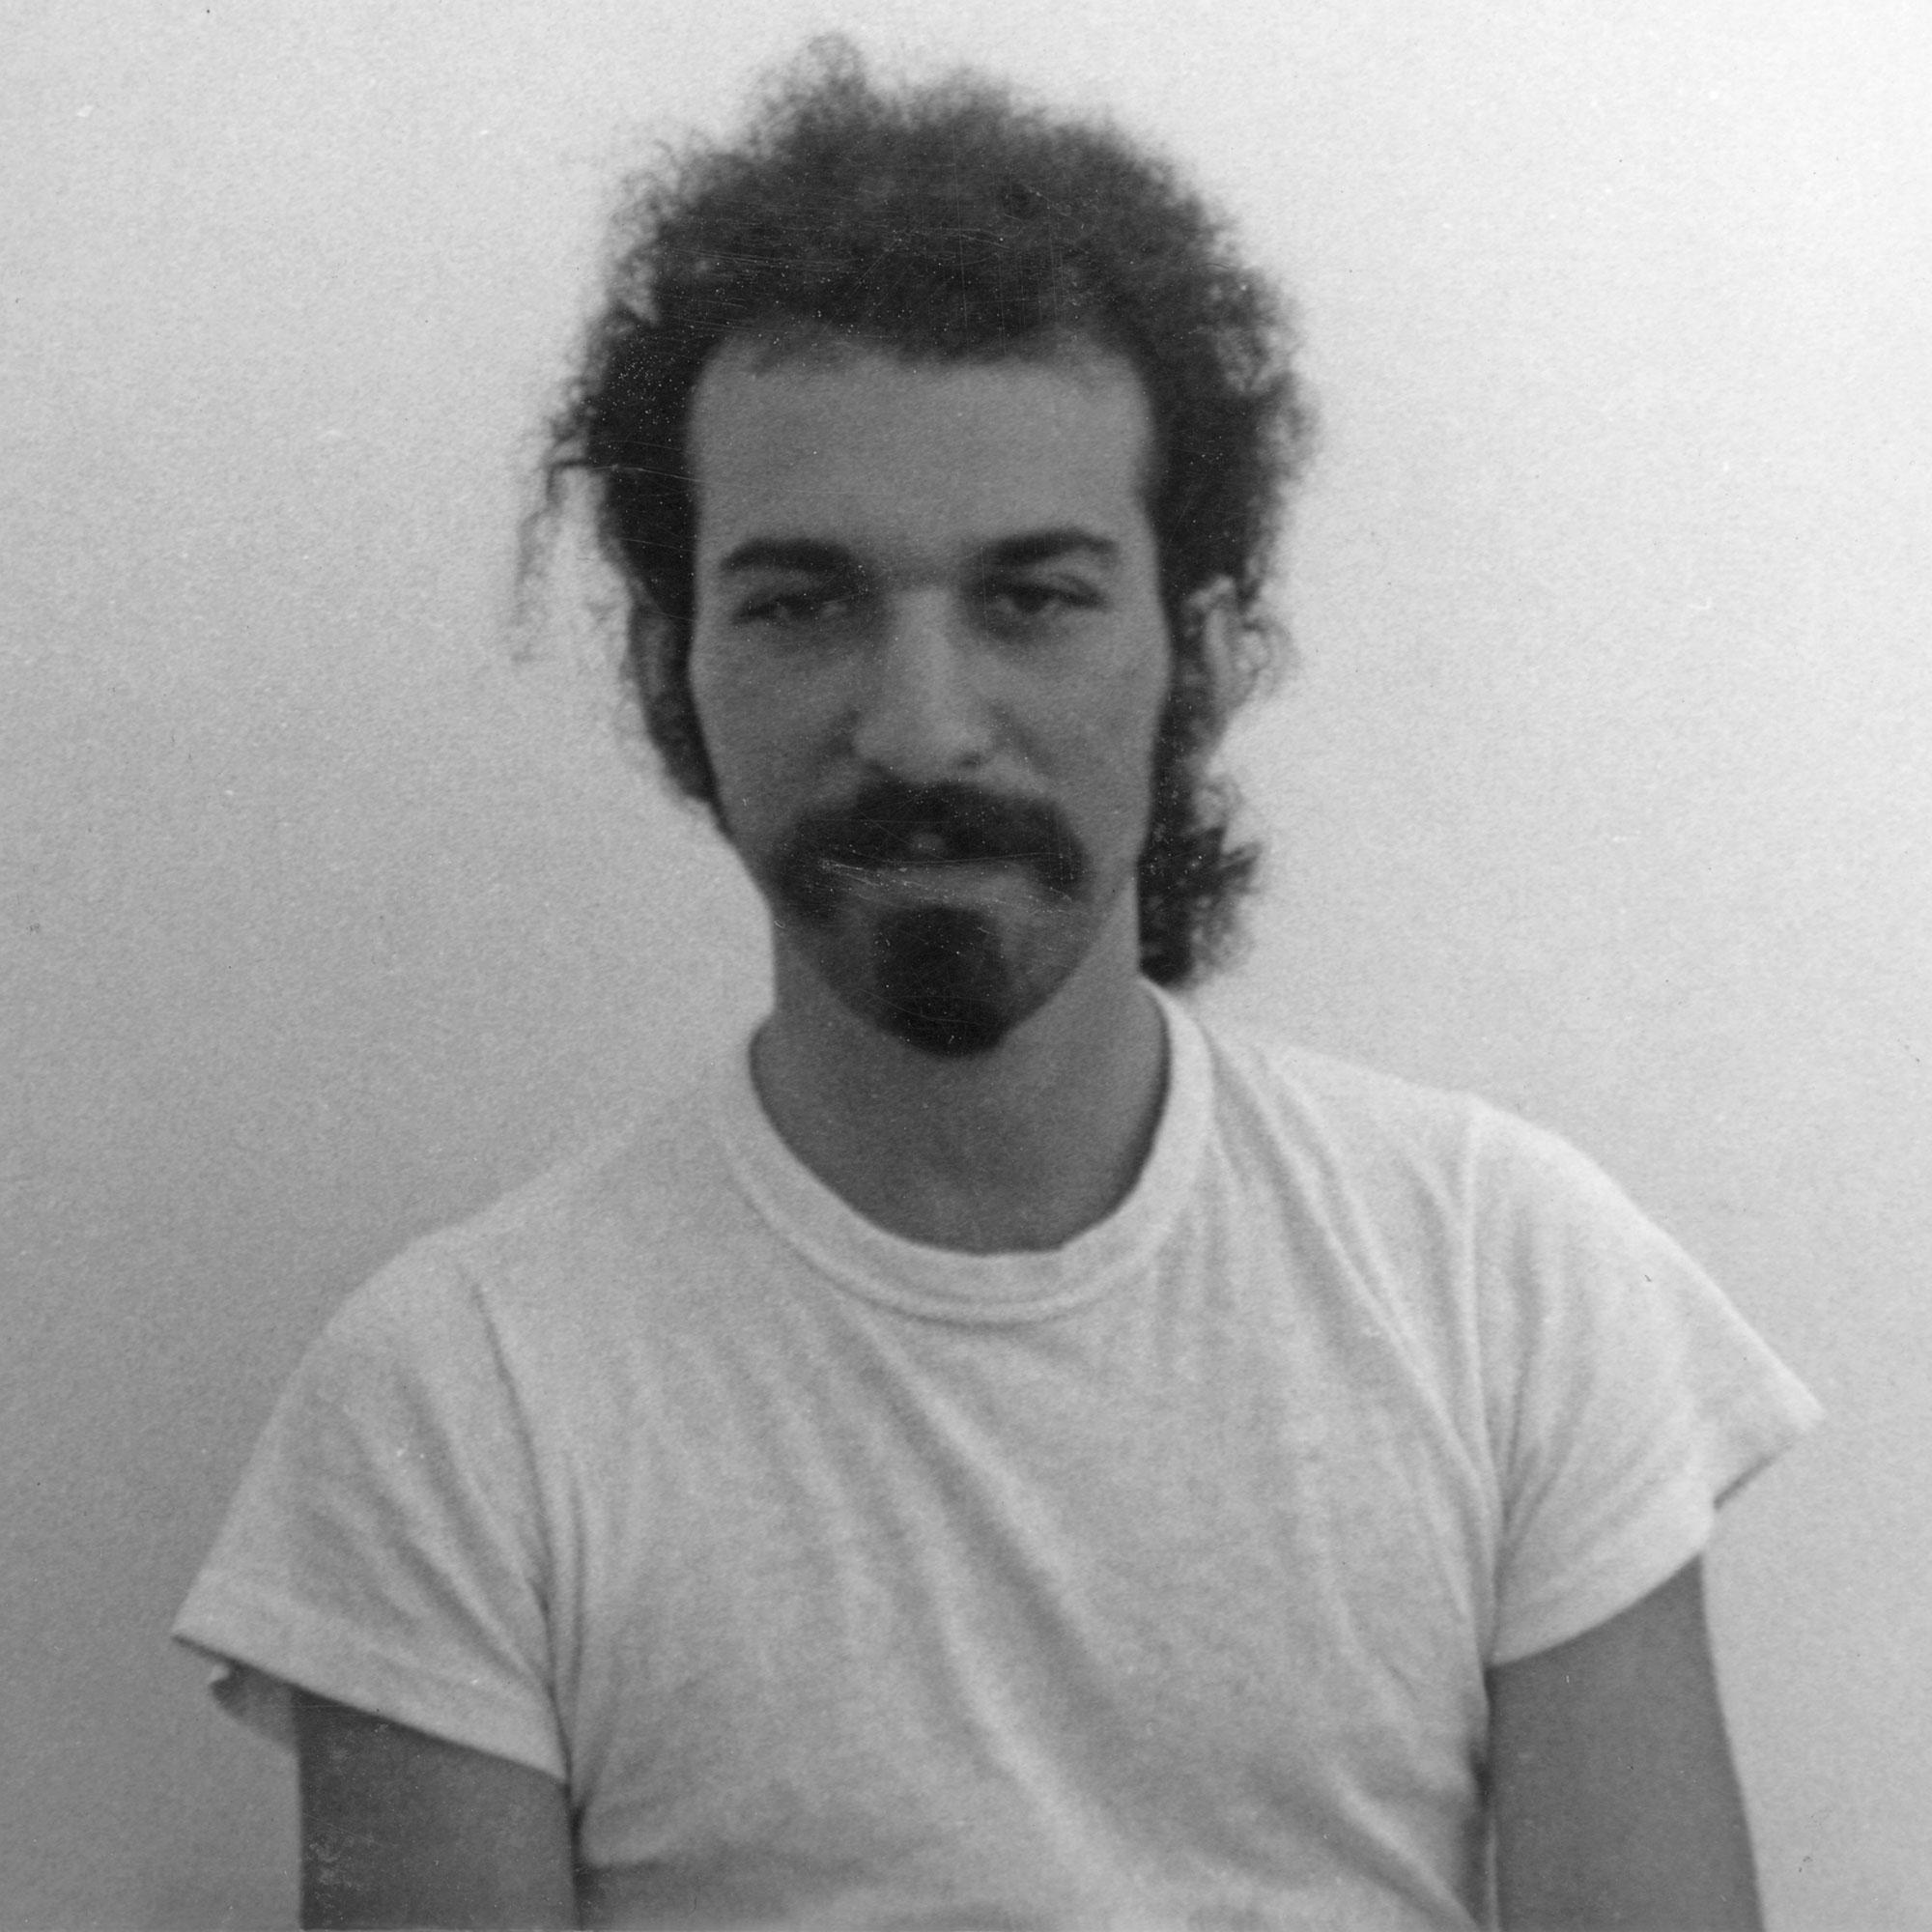 Jeff Reiter, Bloomington mugshots by Paul Dodd 1971